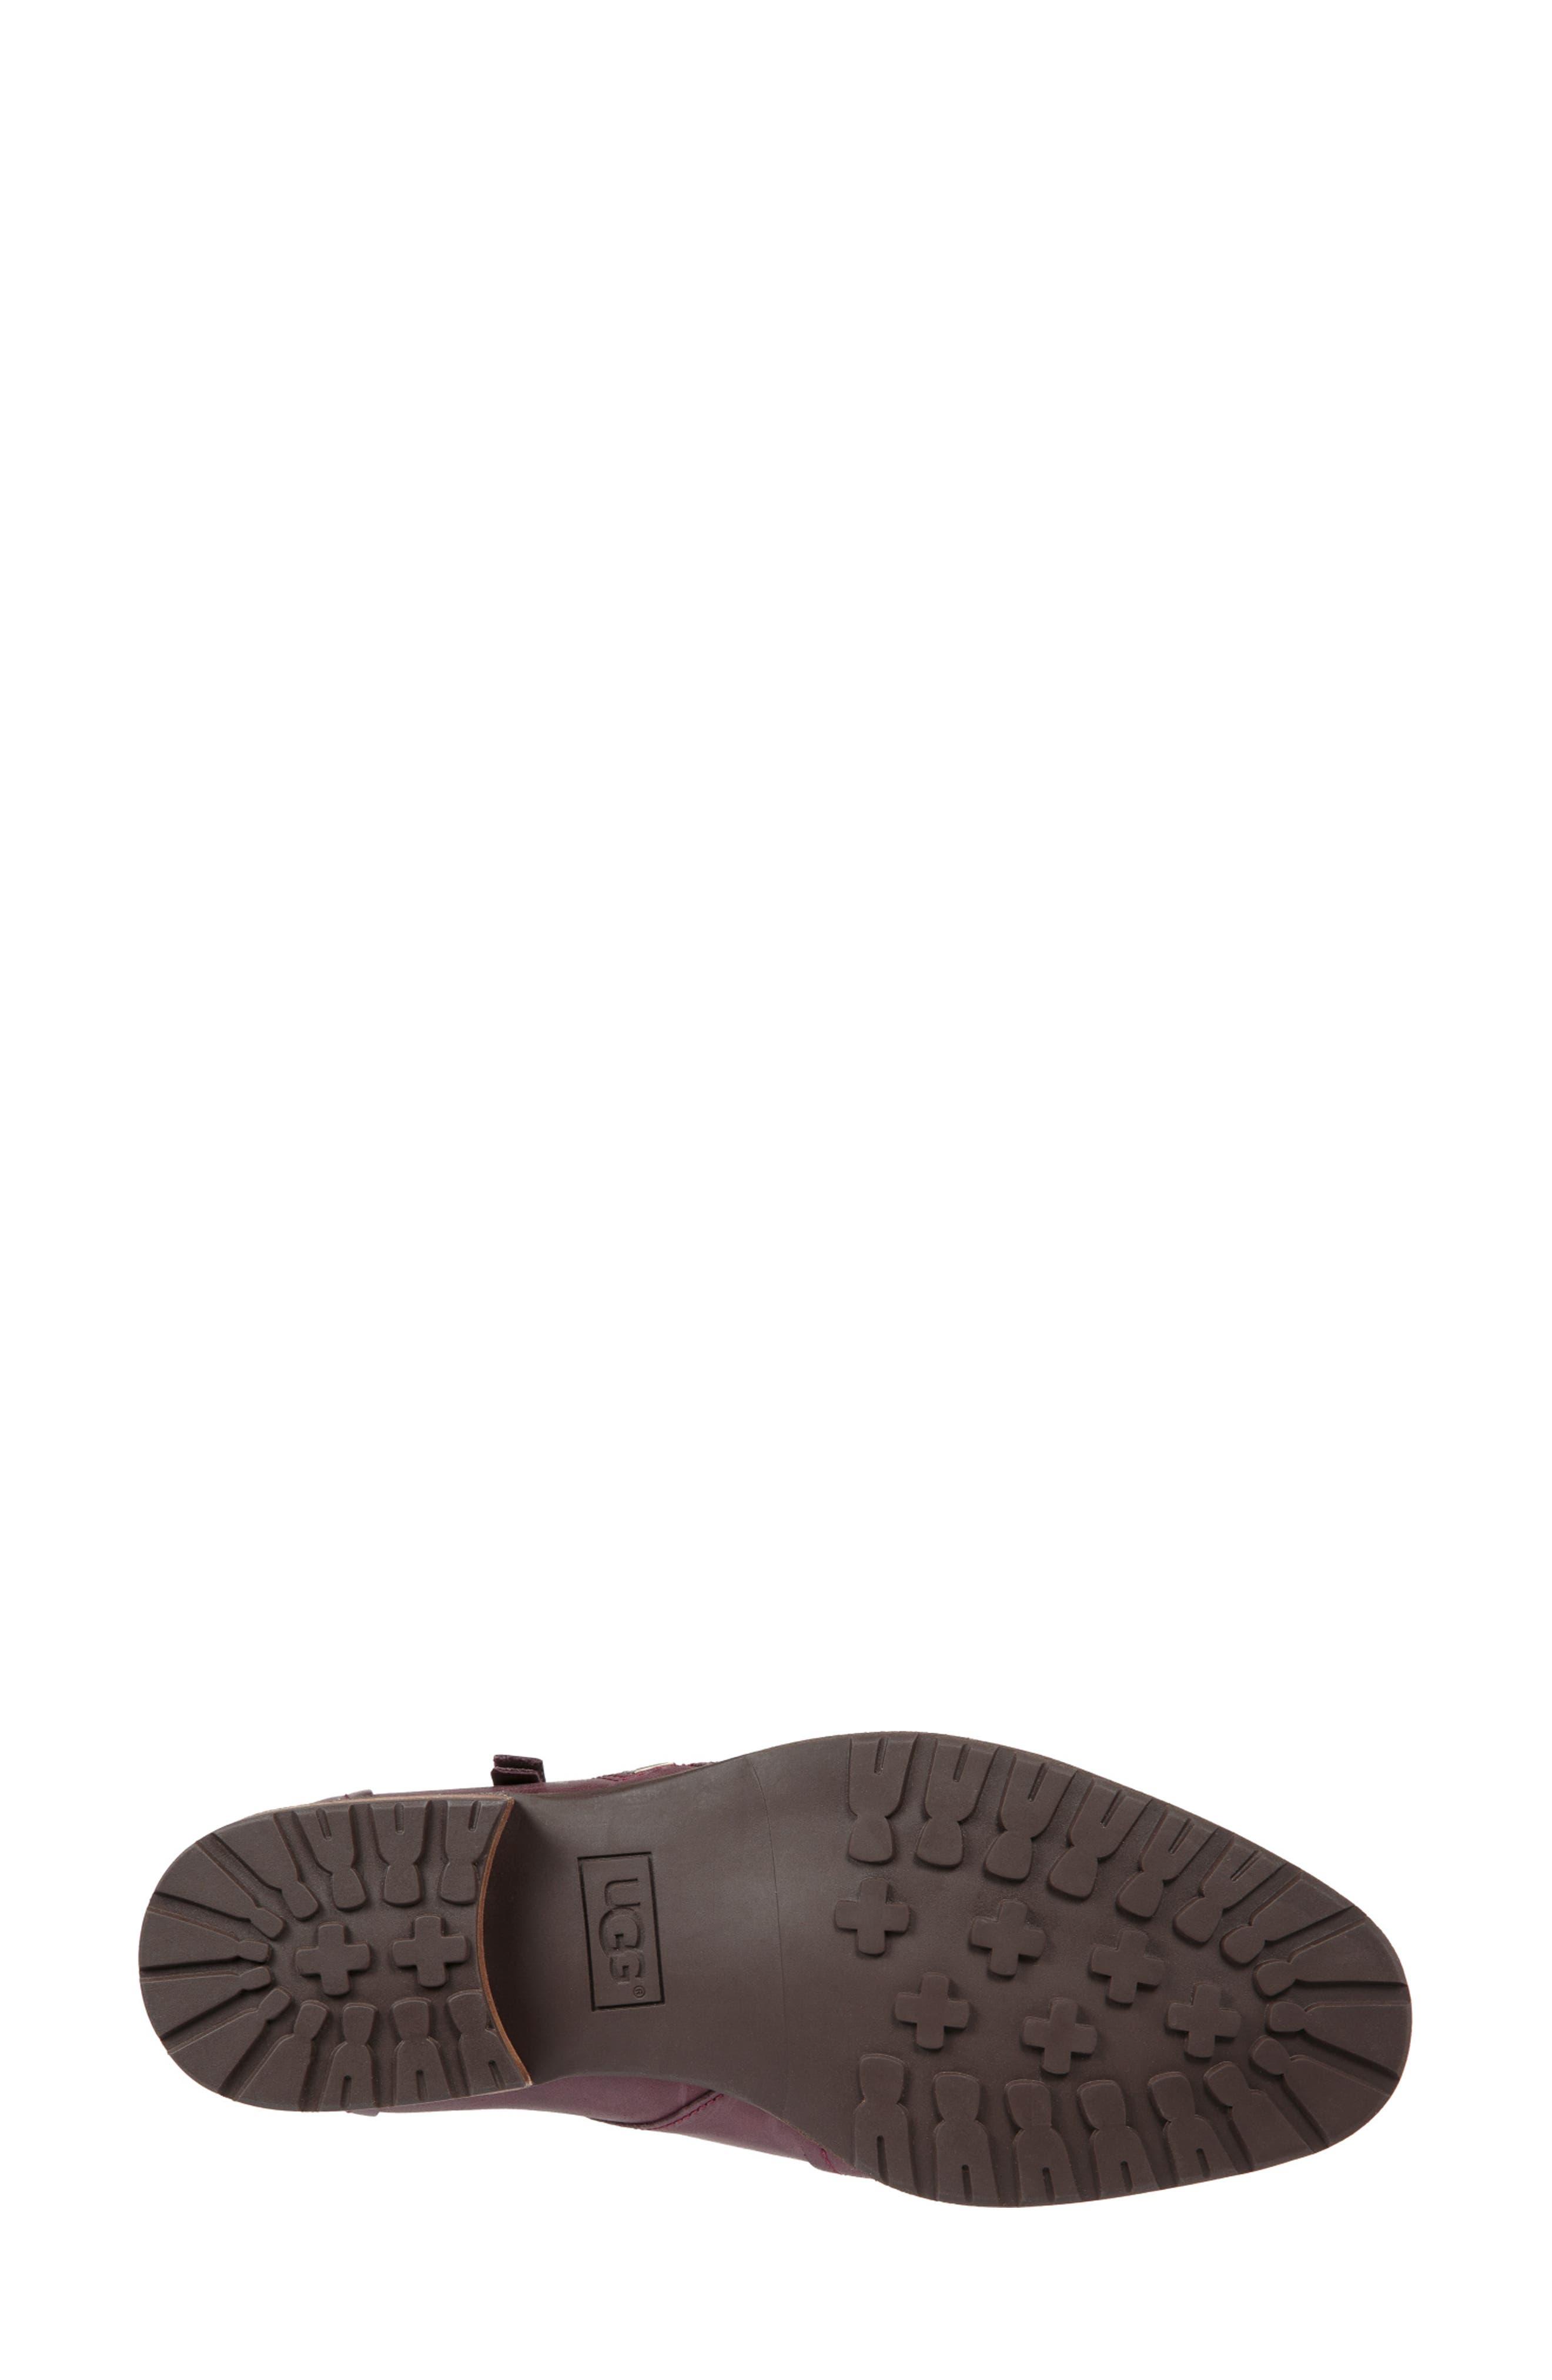 Aureo Bootie,                             Alternate thumbnail 3, color,                             Oxblood Leather